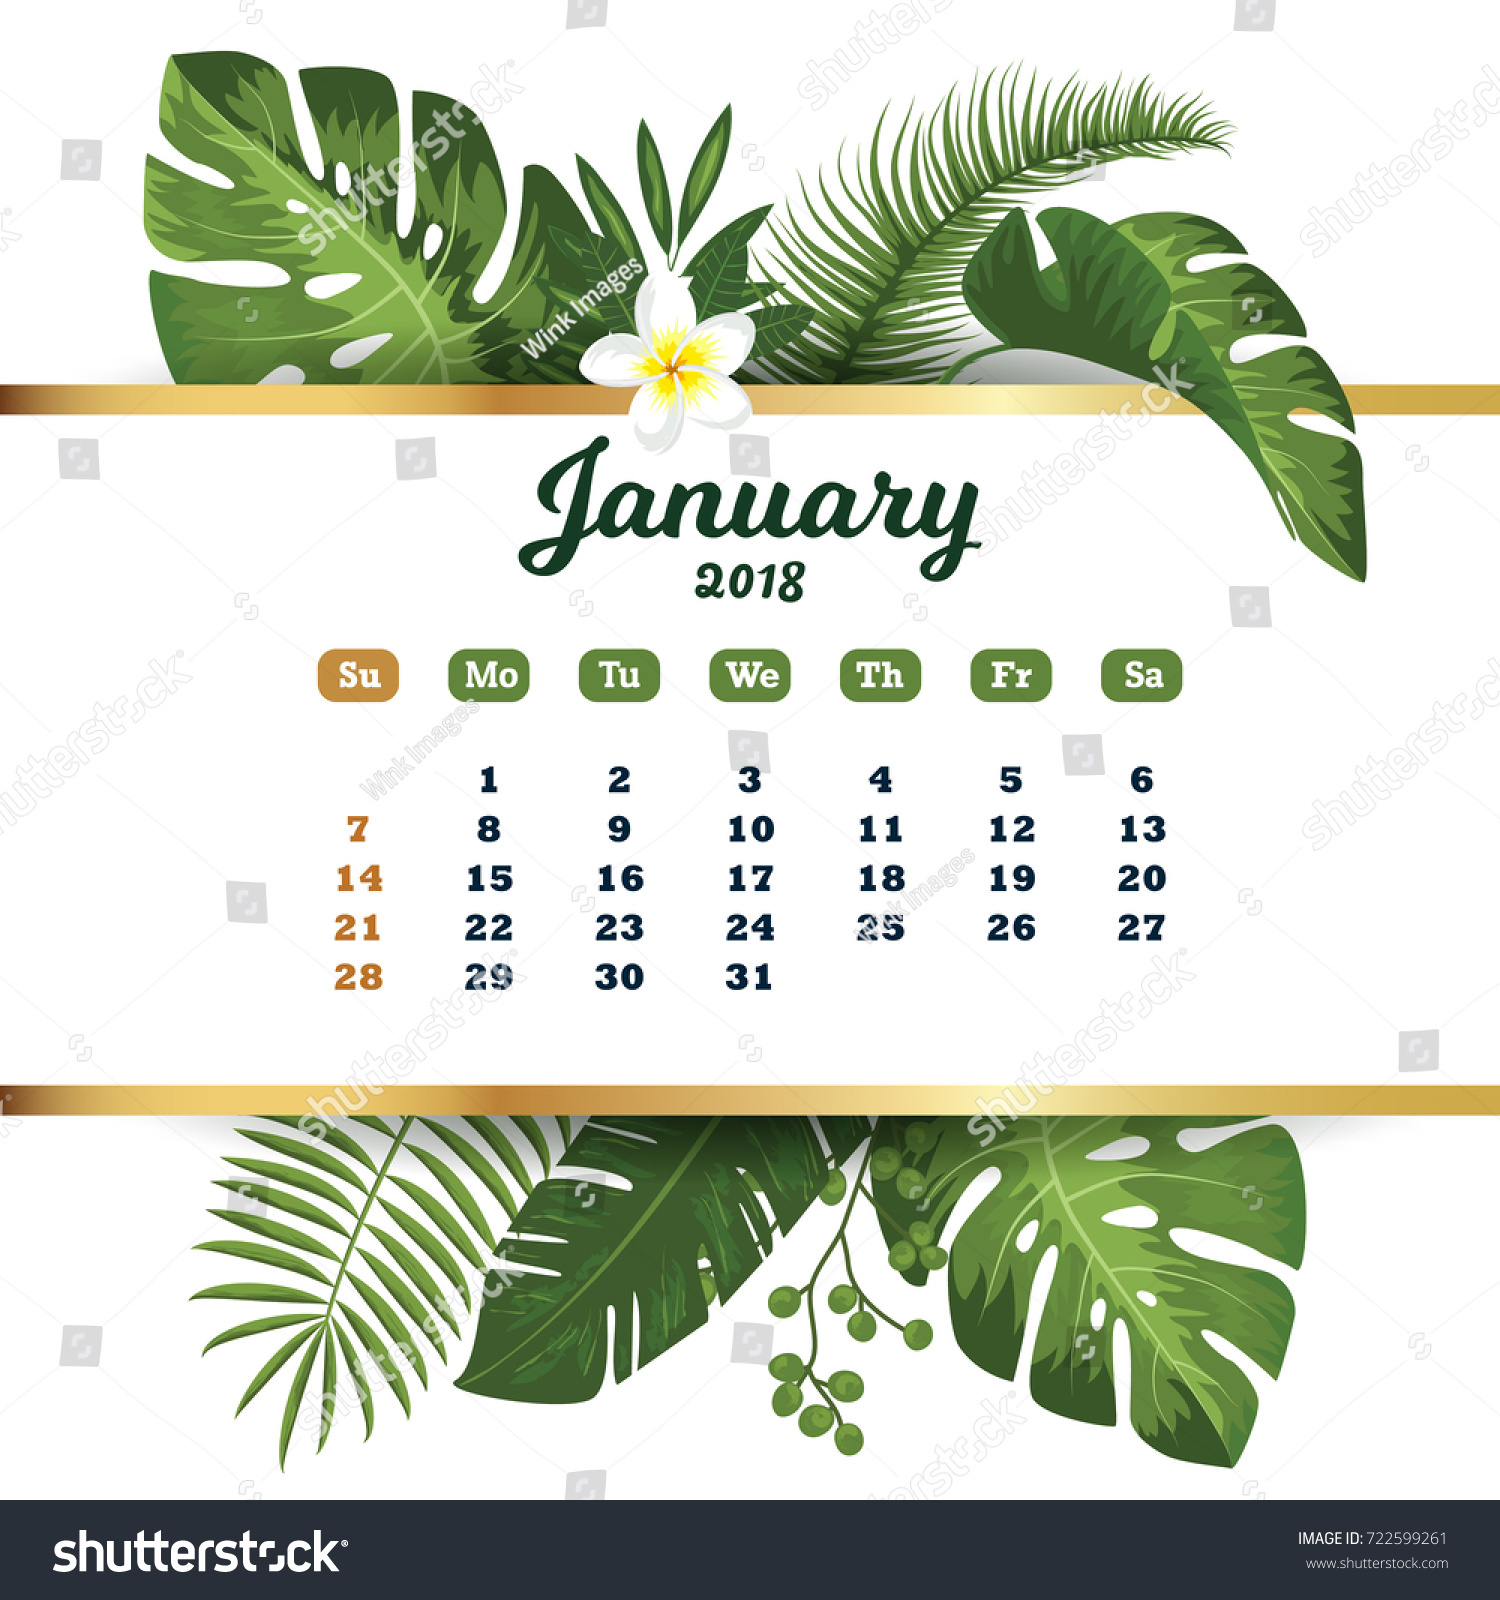 January 2018 Tropical Printable Calendar 2018 Stock Vector ...